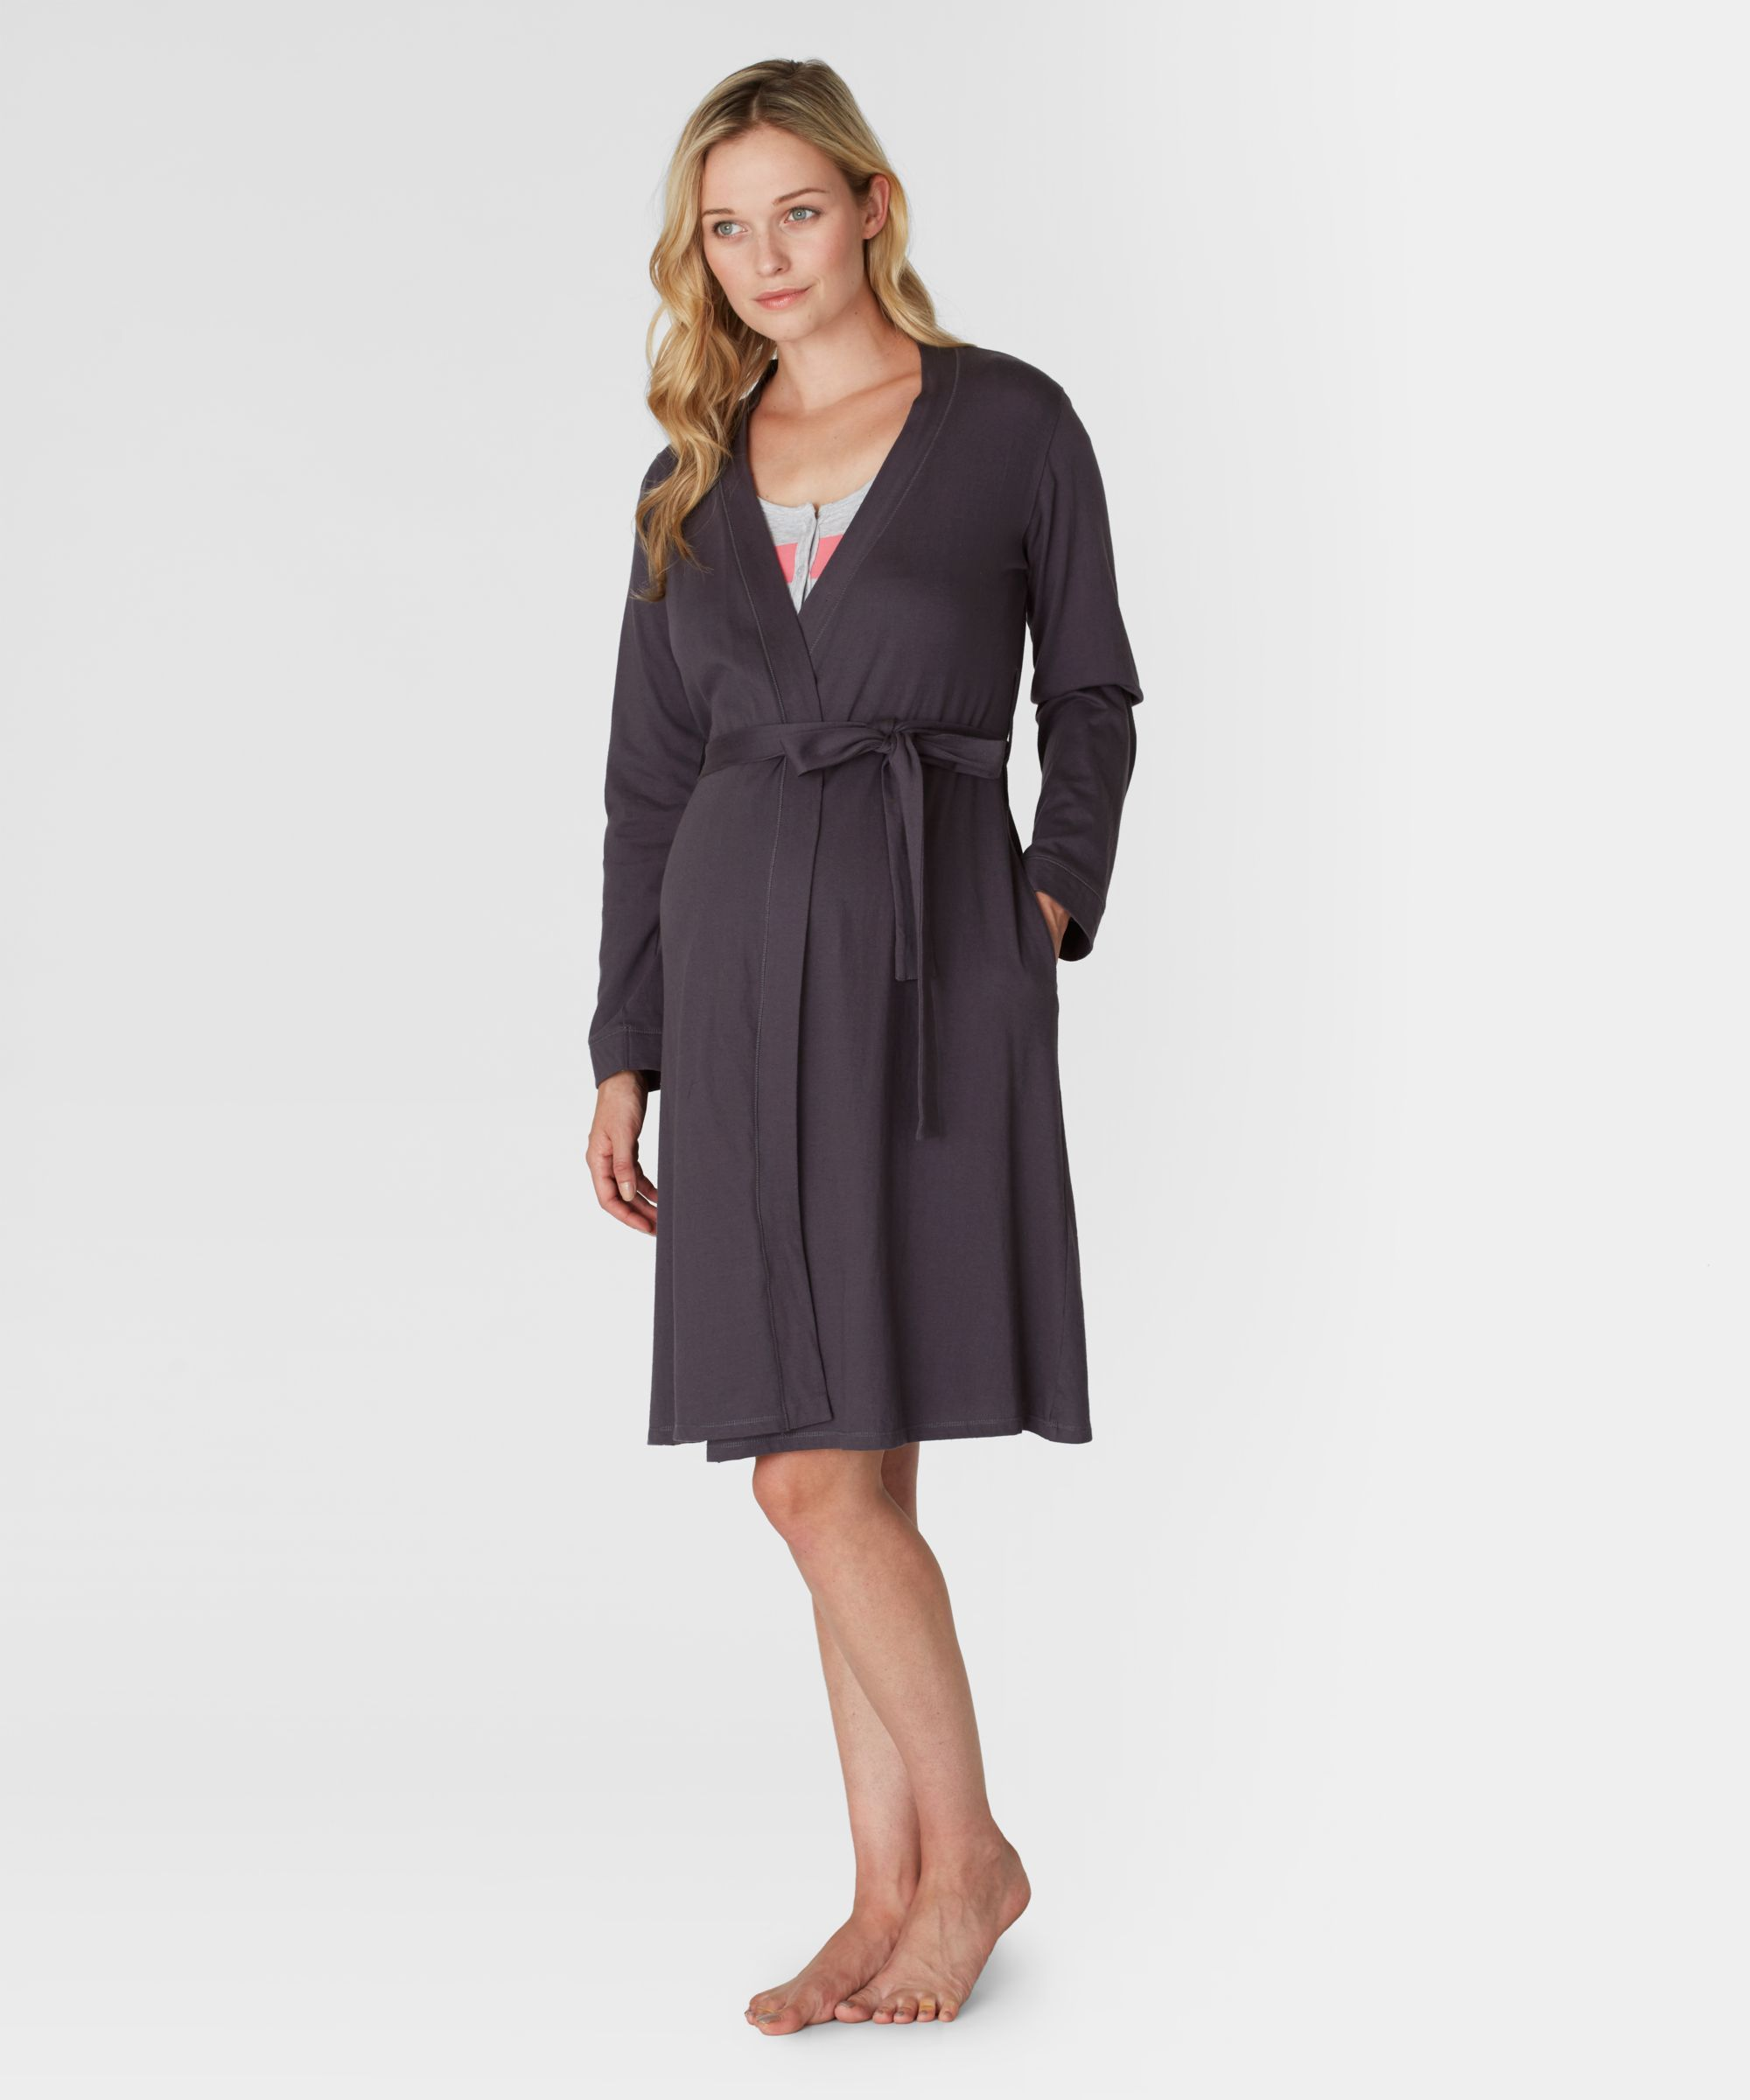 Maternity Charcoal Robe